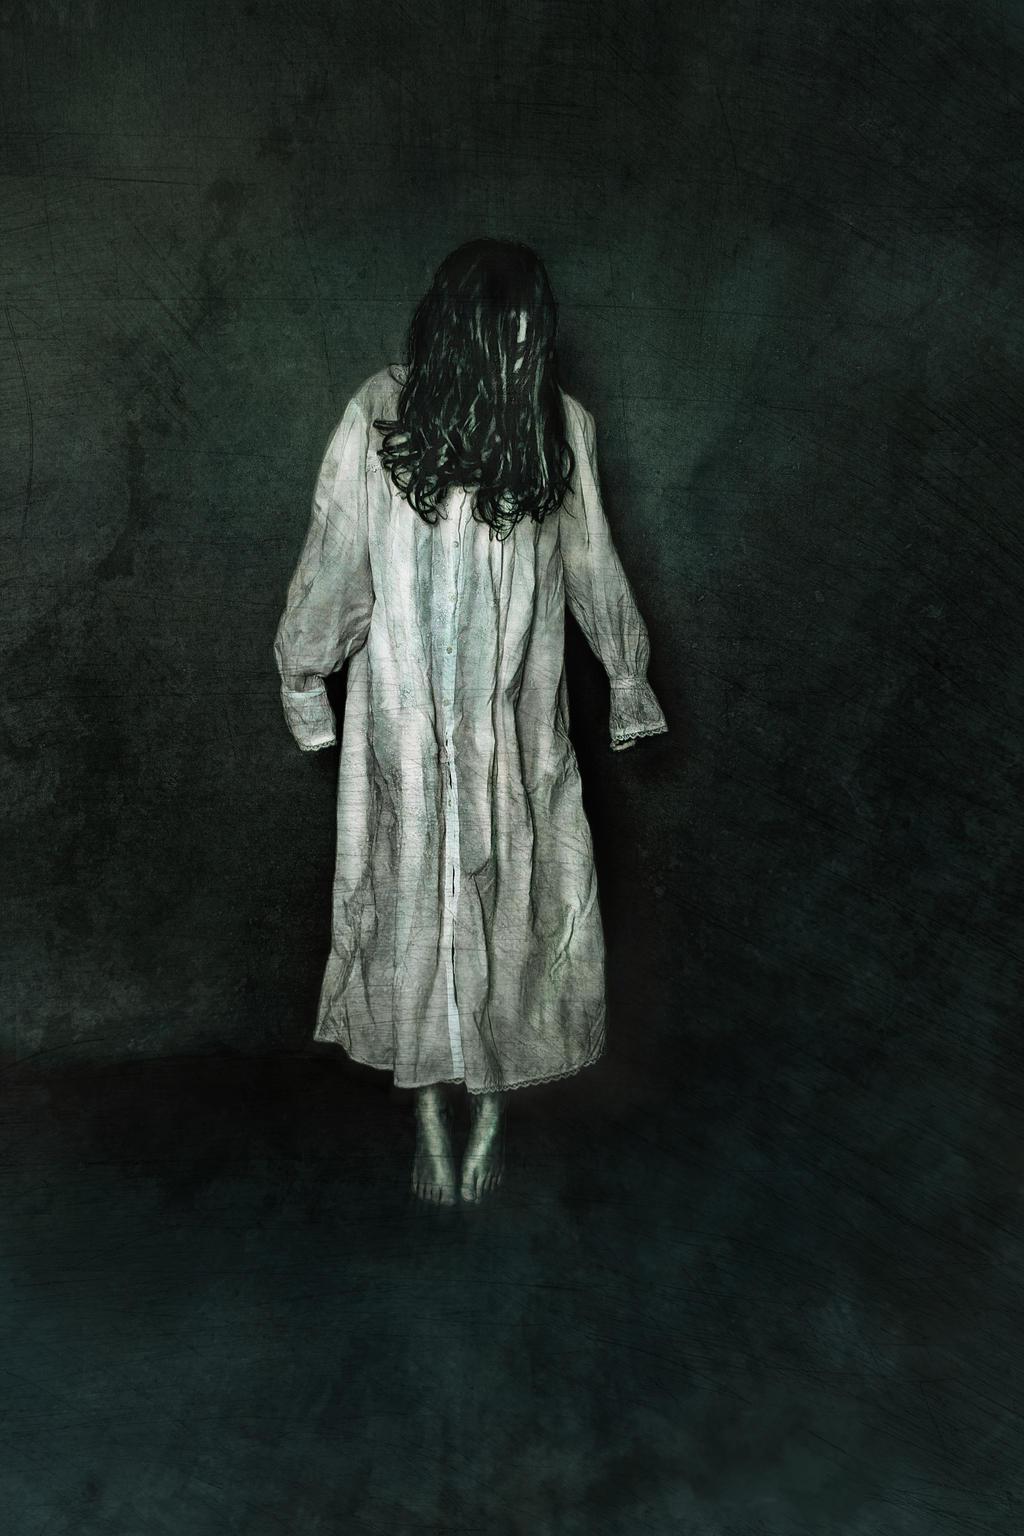 Creeper by SpokeninRed on DeviantArt